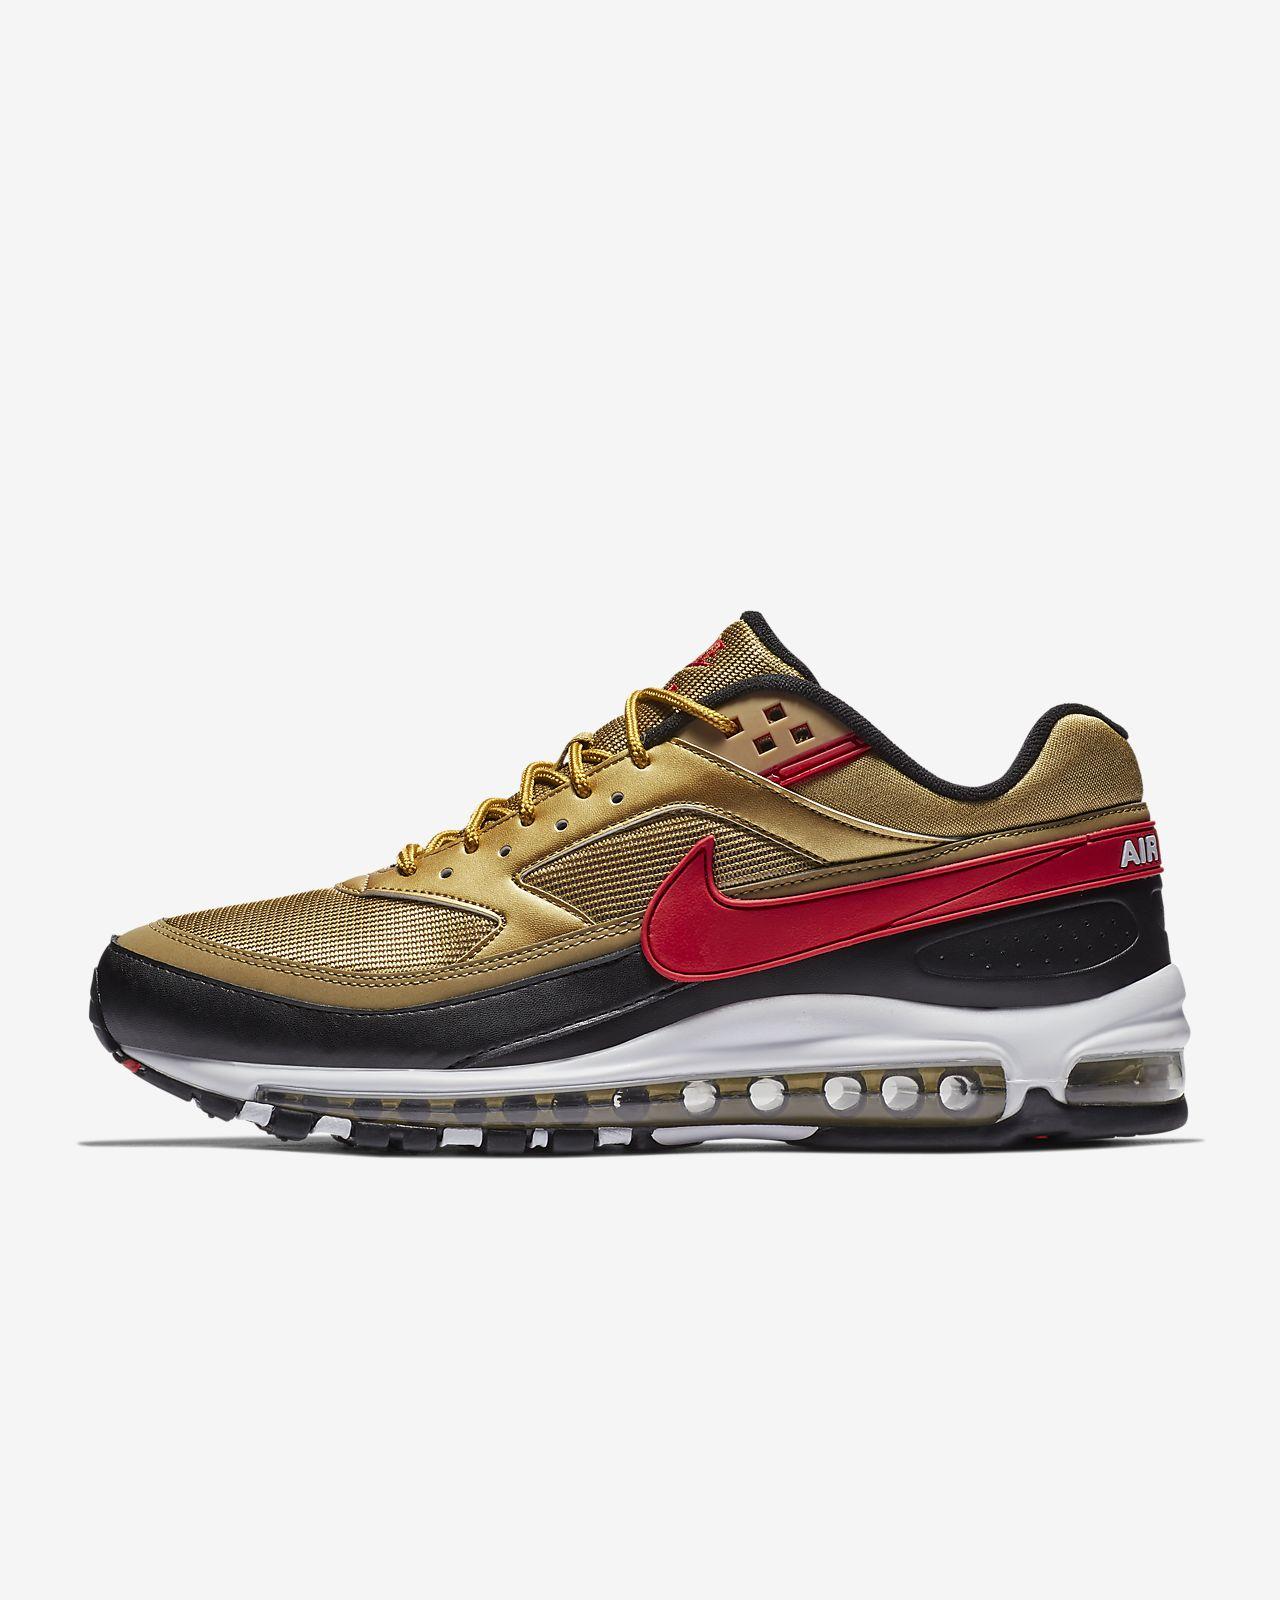 Nike BW hombre